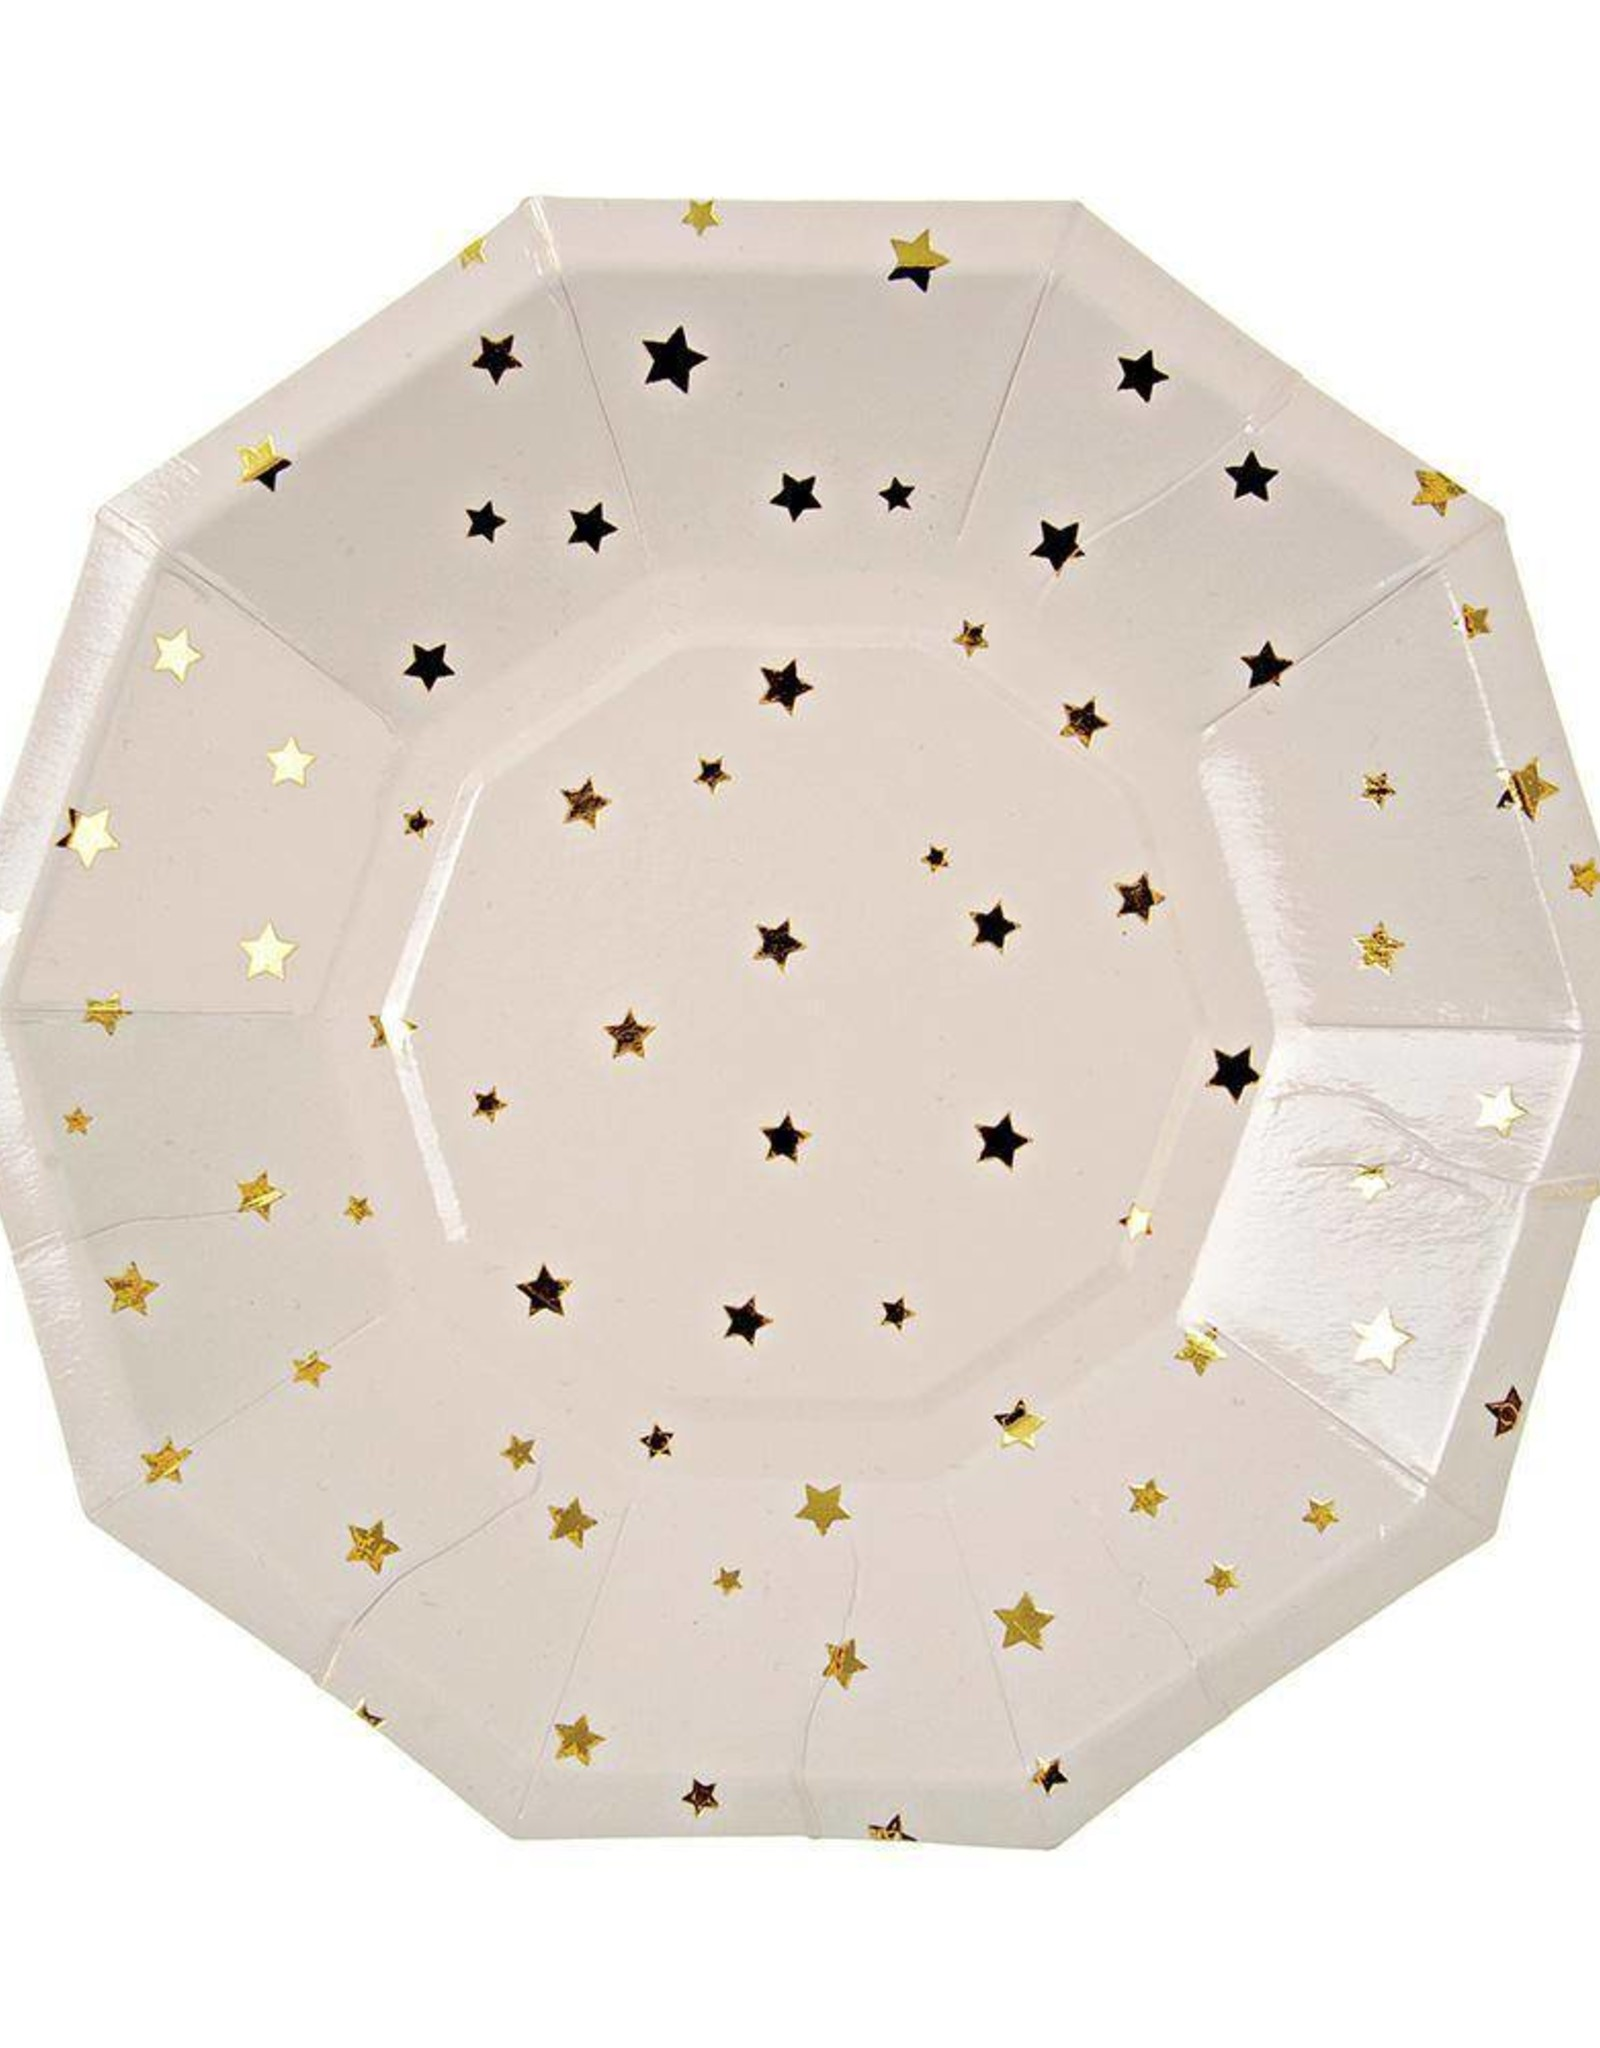 Meri Meri gold stars plates small